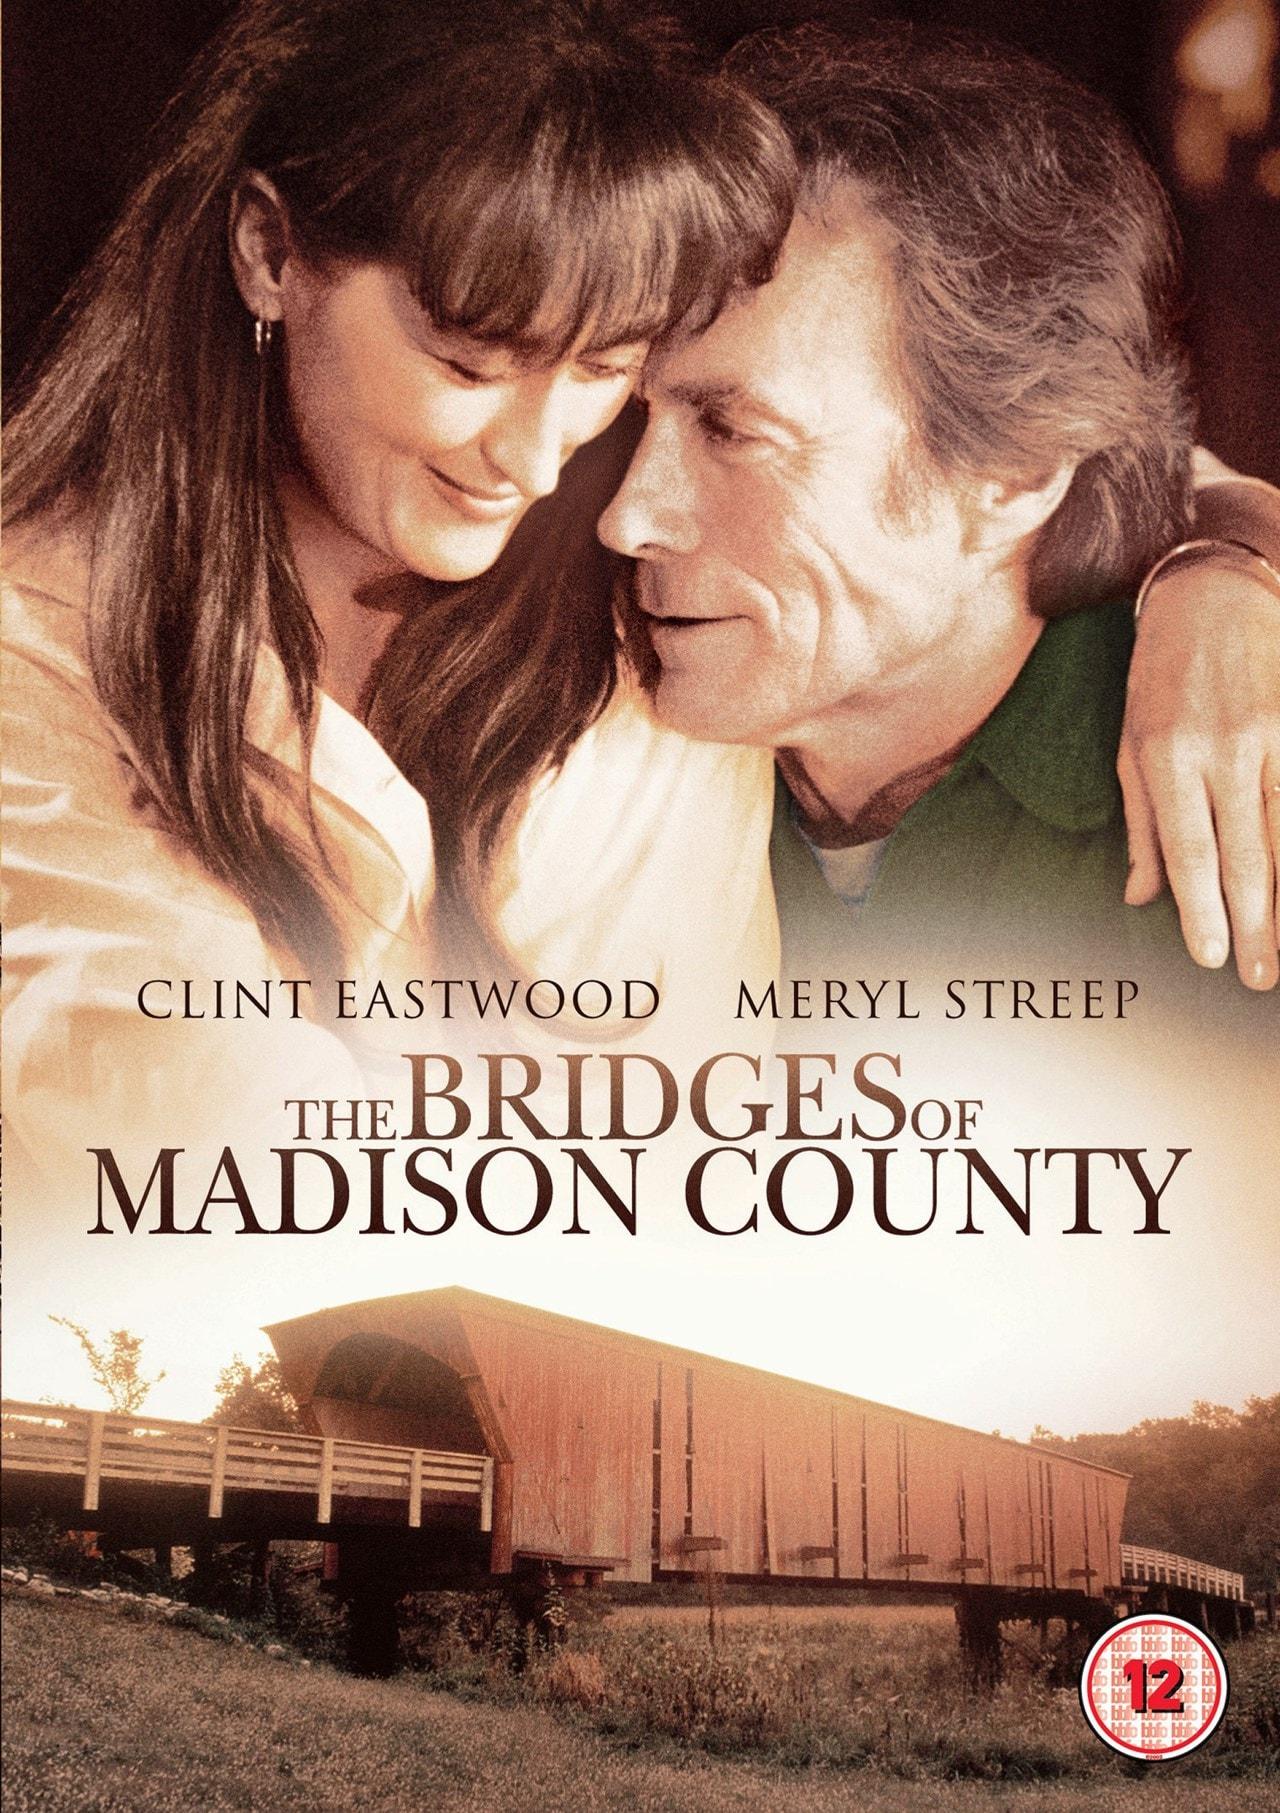 The Bridges of Madison County - 1